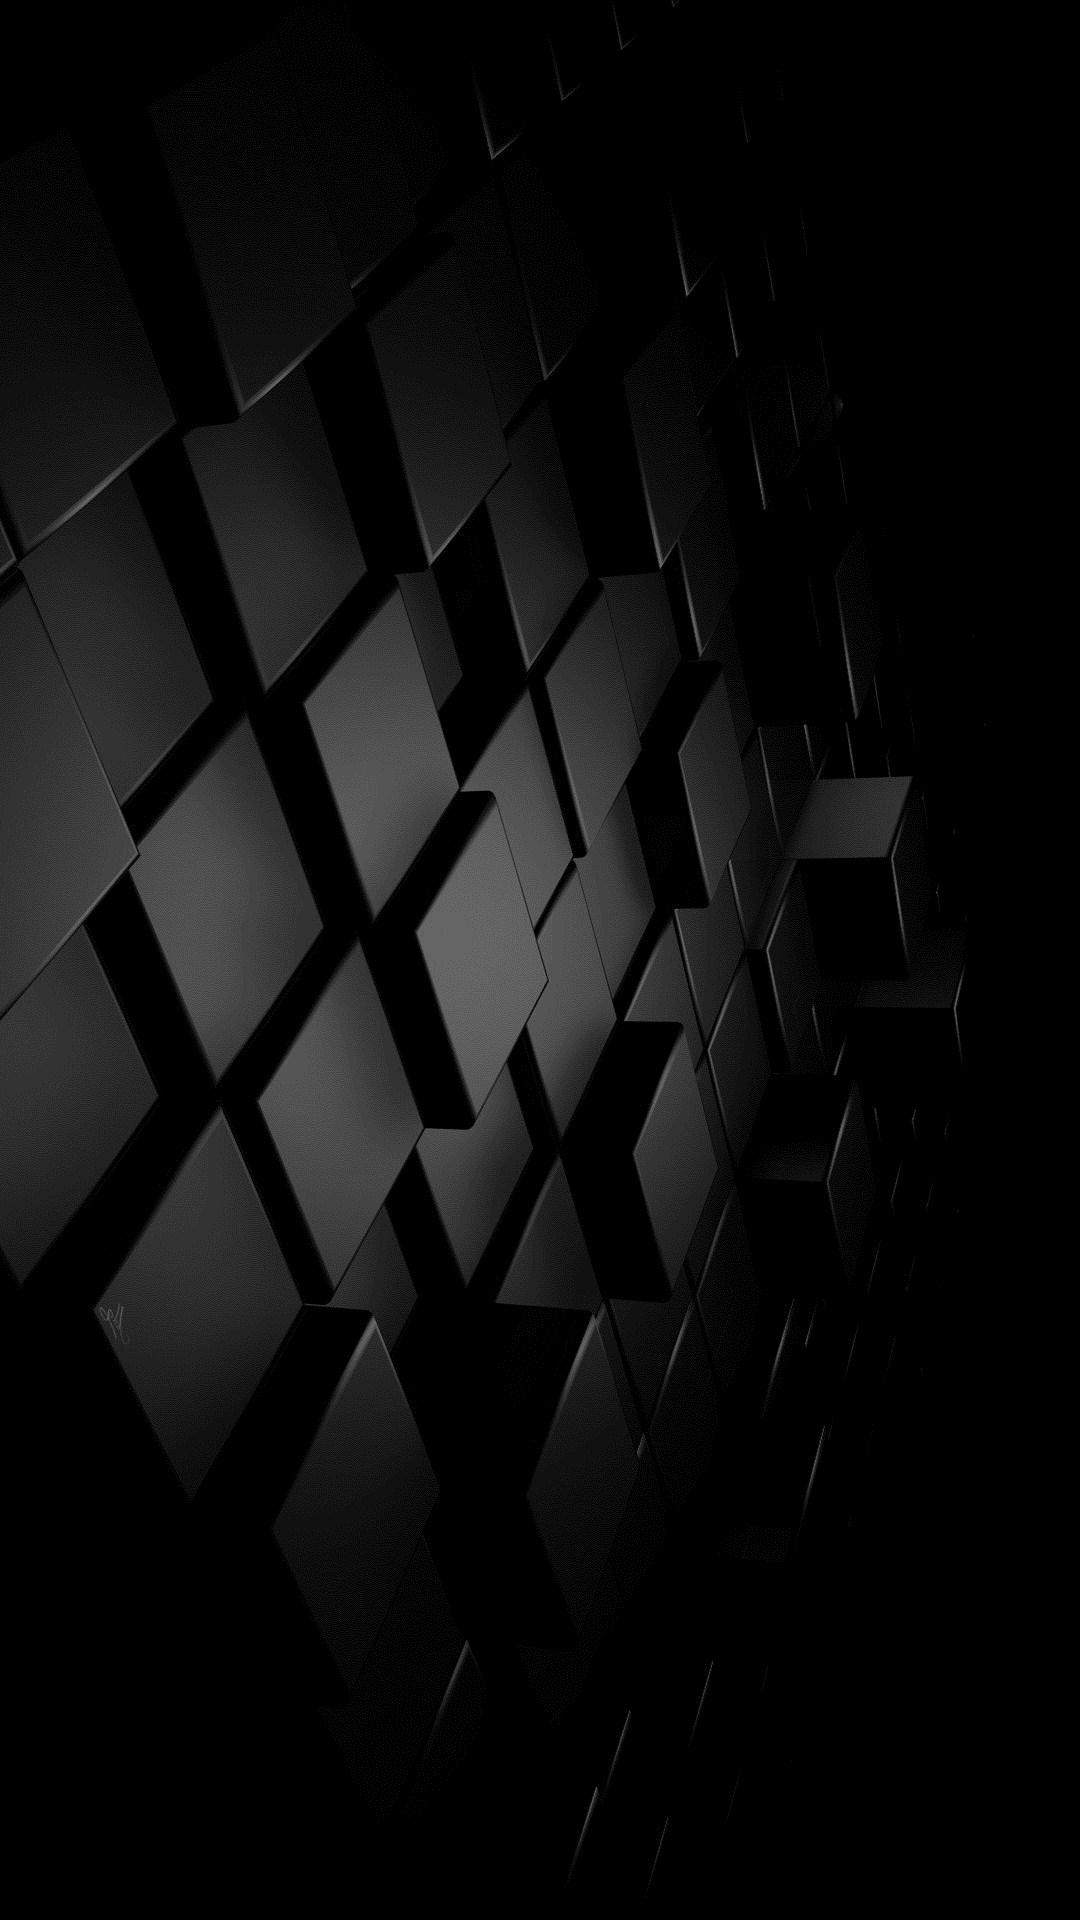 Black iPhone Wallpapers - Wallpaper Cave